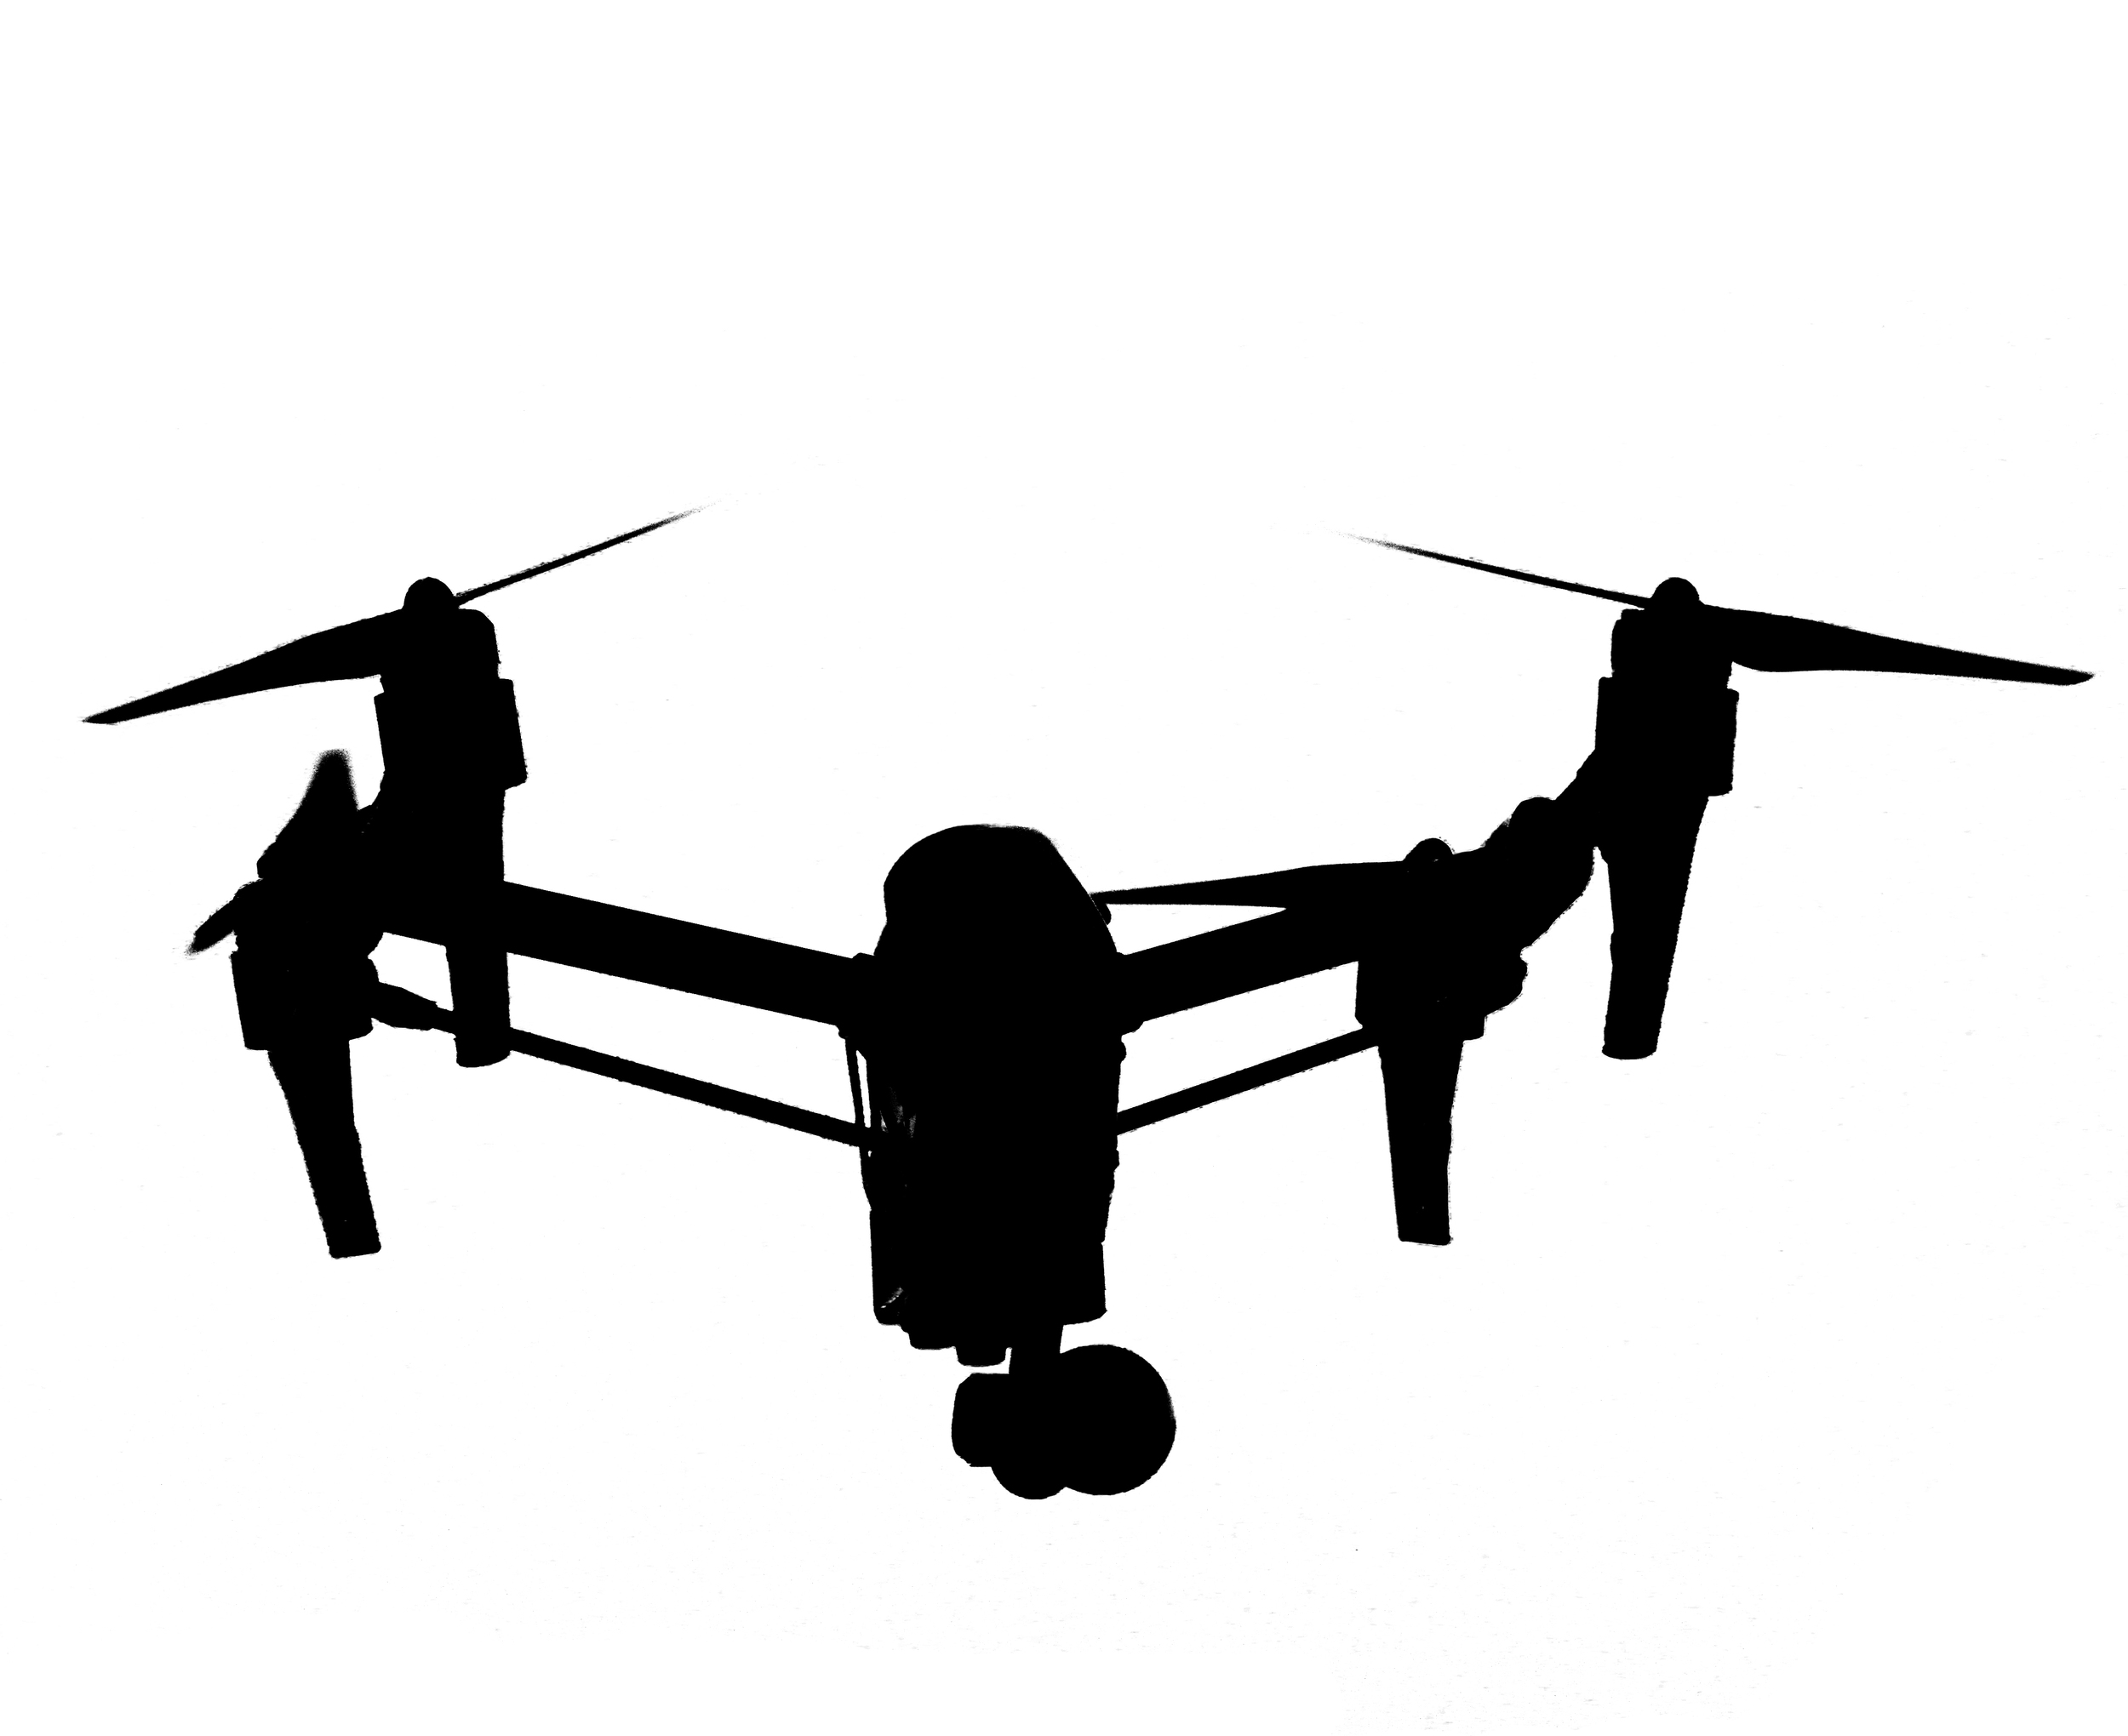 DJI Inspire vector (flying)